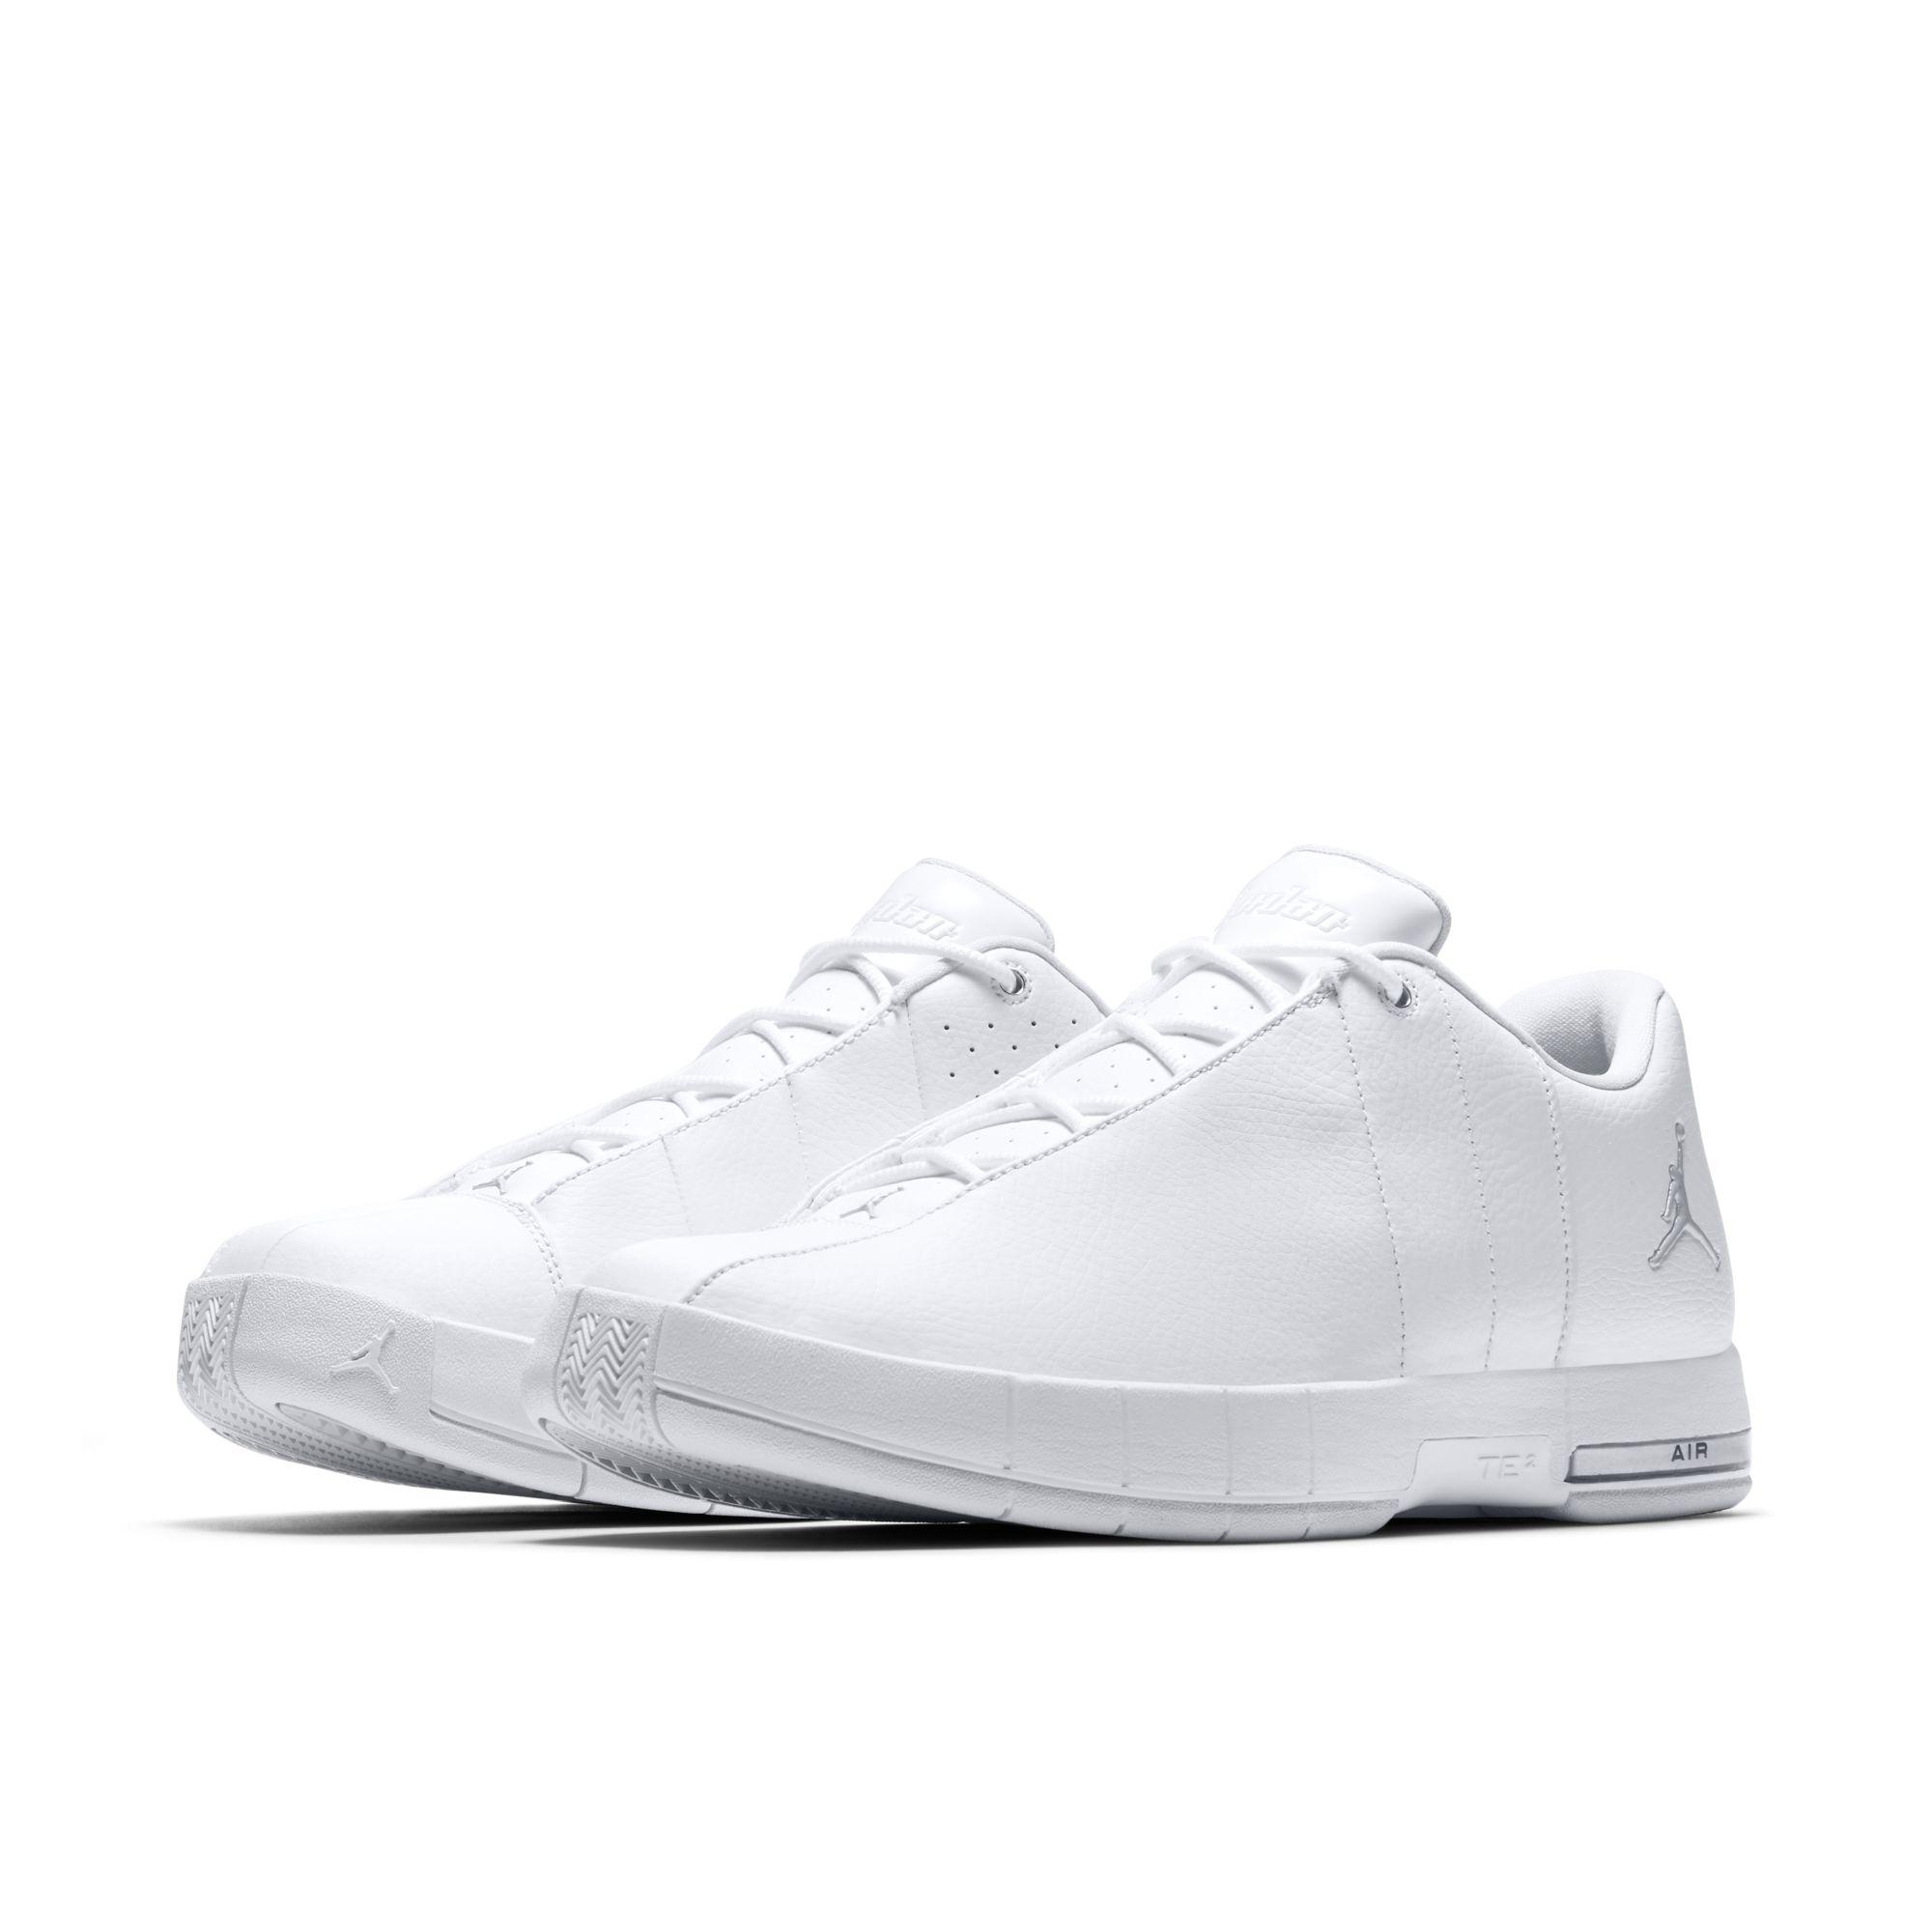 Jordan-Team-Elite-2-Low-White-4